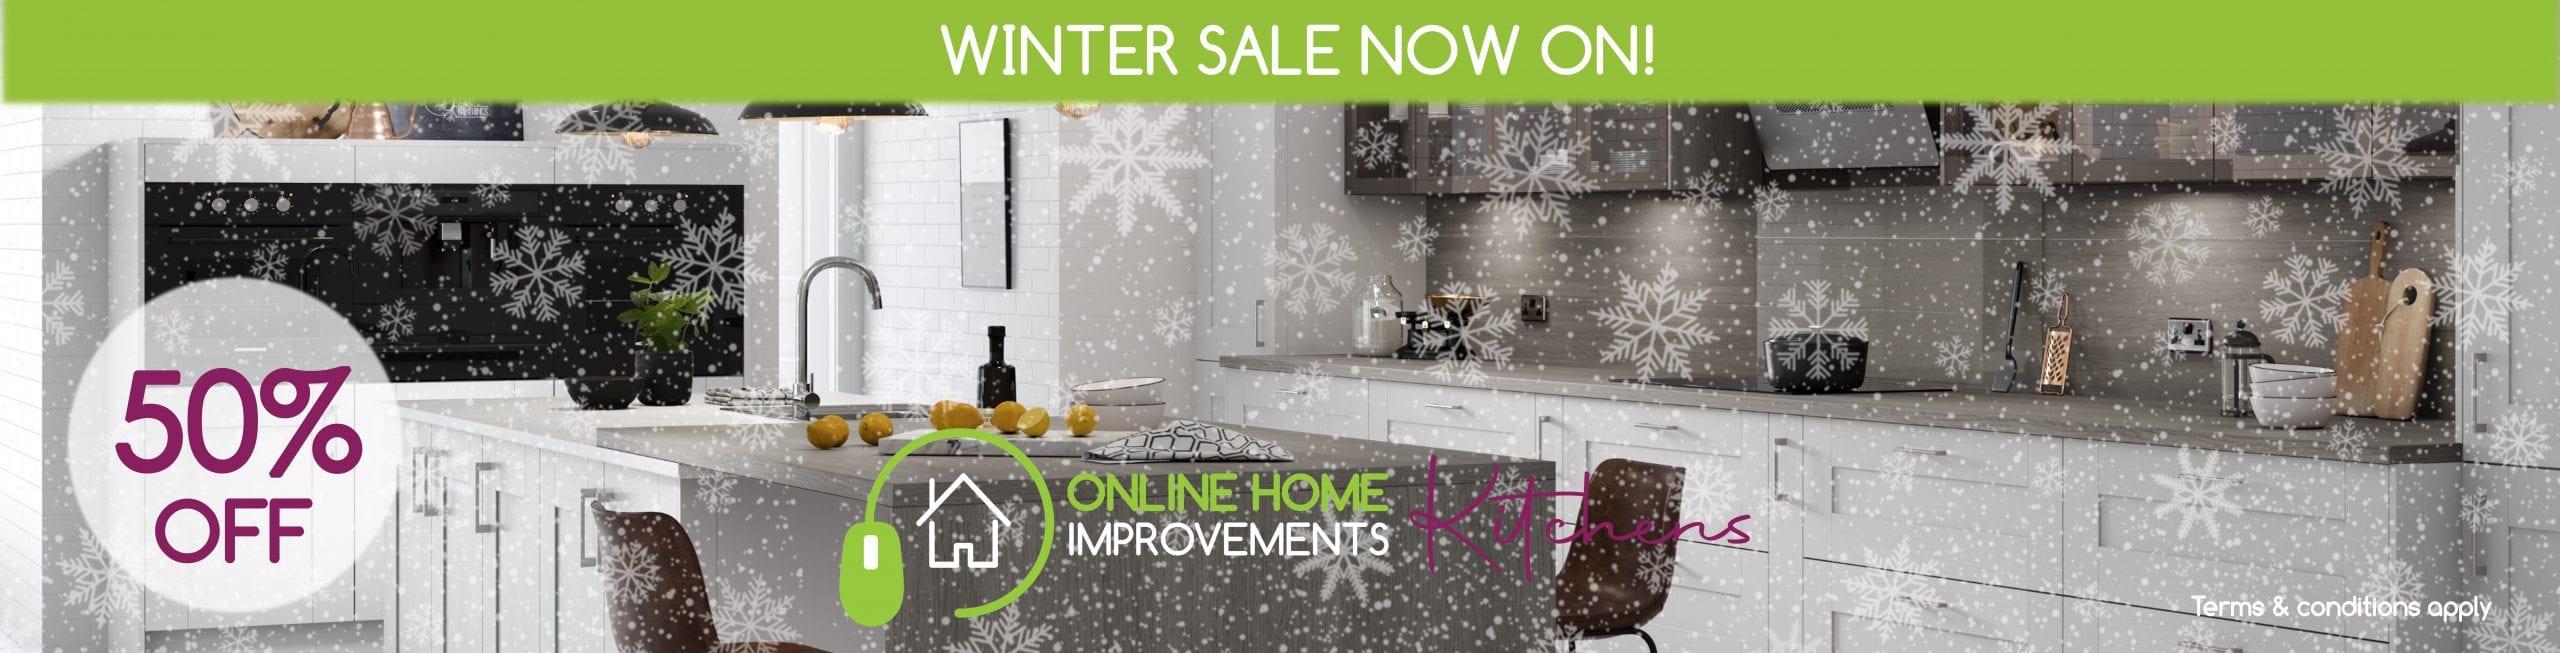 Winter Sale banner OHI